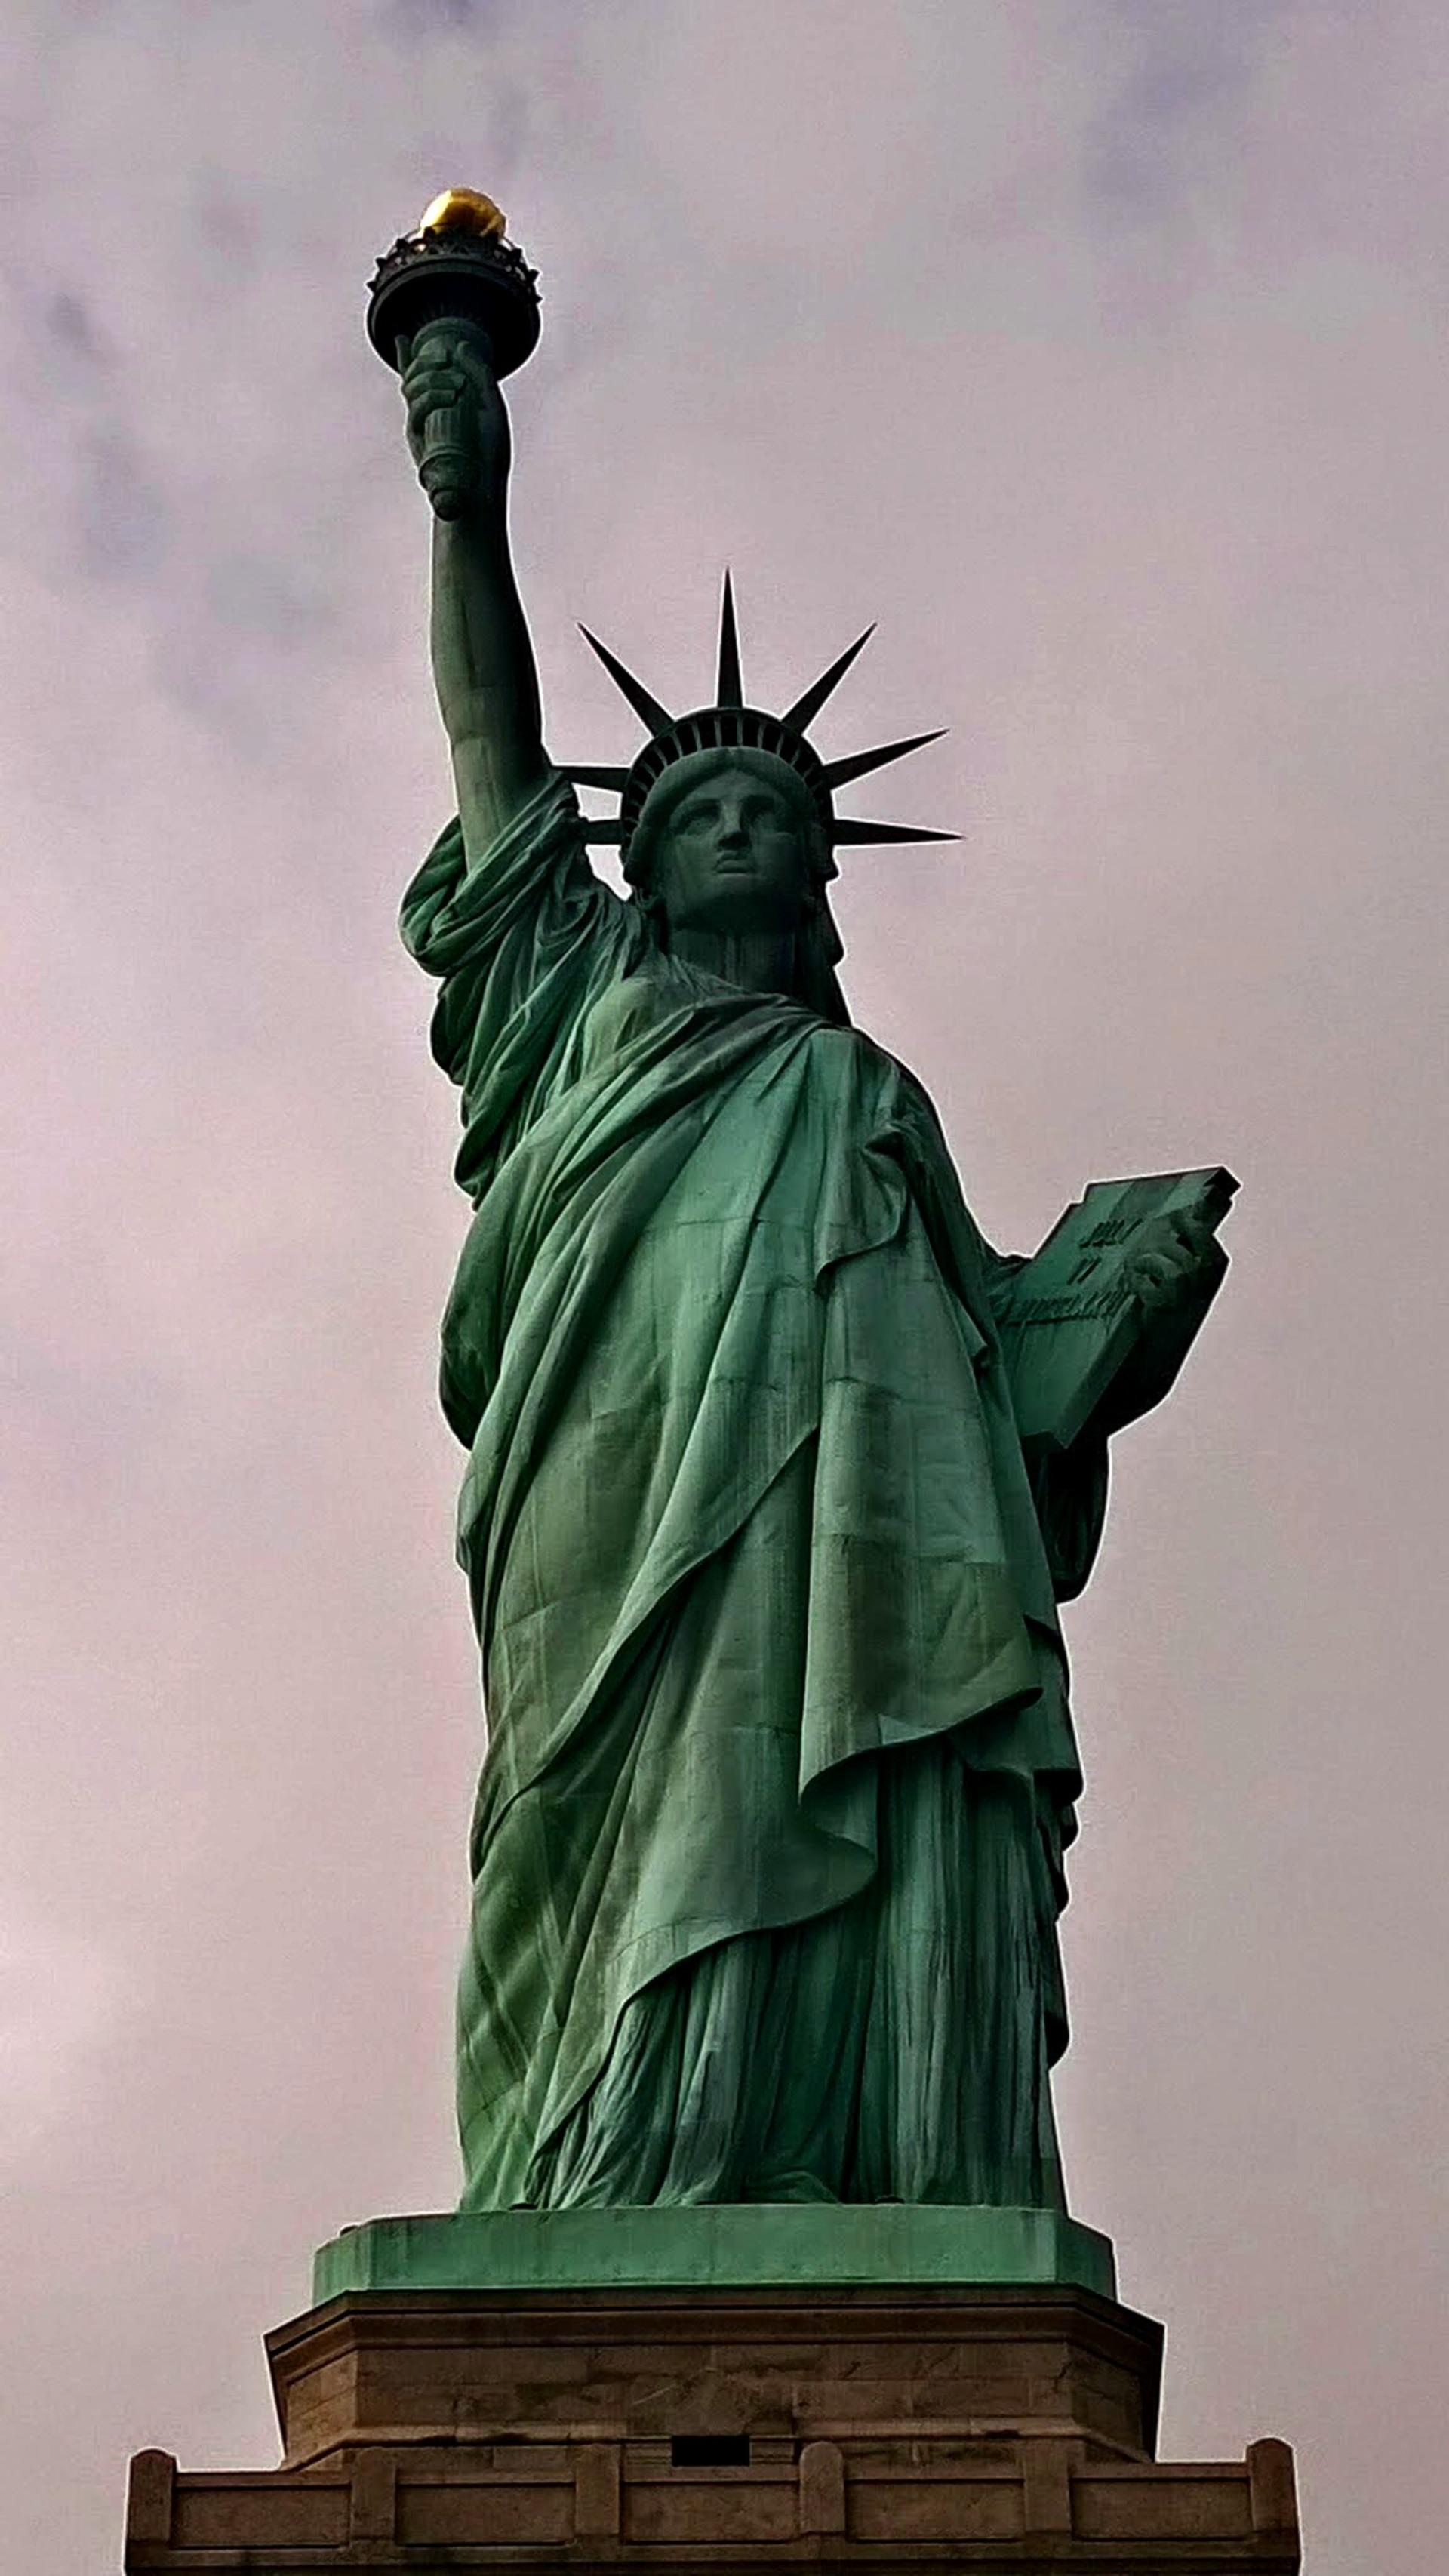 statue of liberty | elise81, lady liberty, nyc, new york